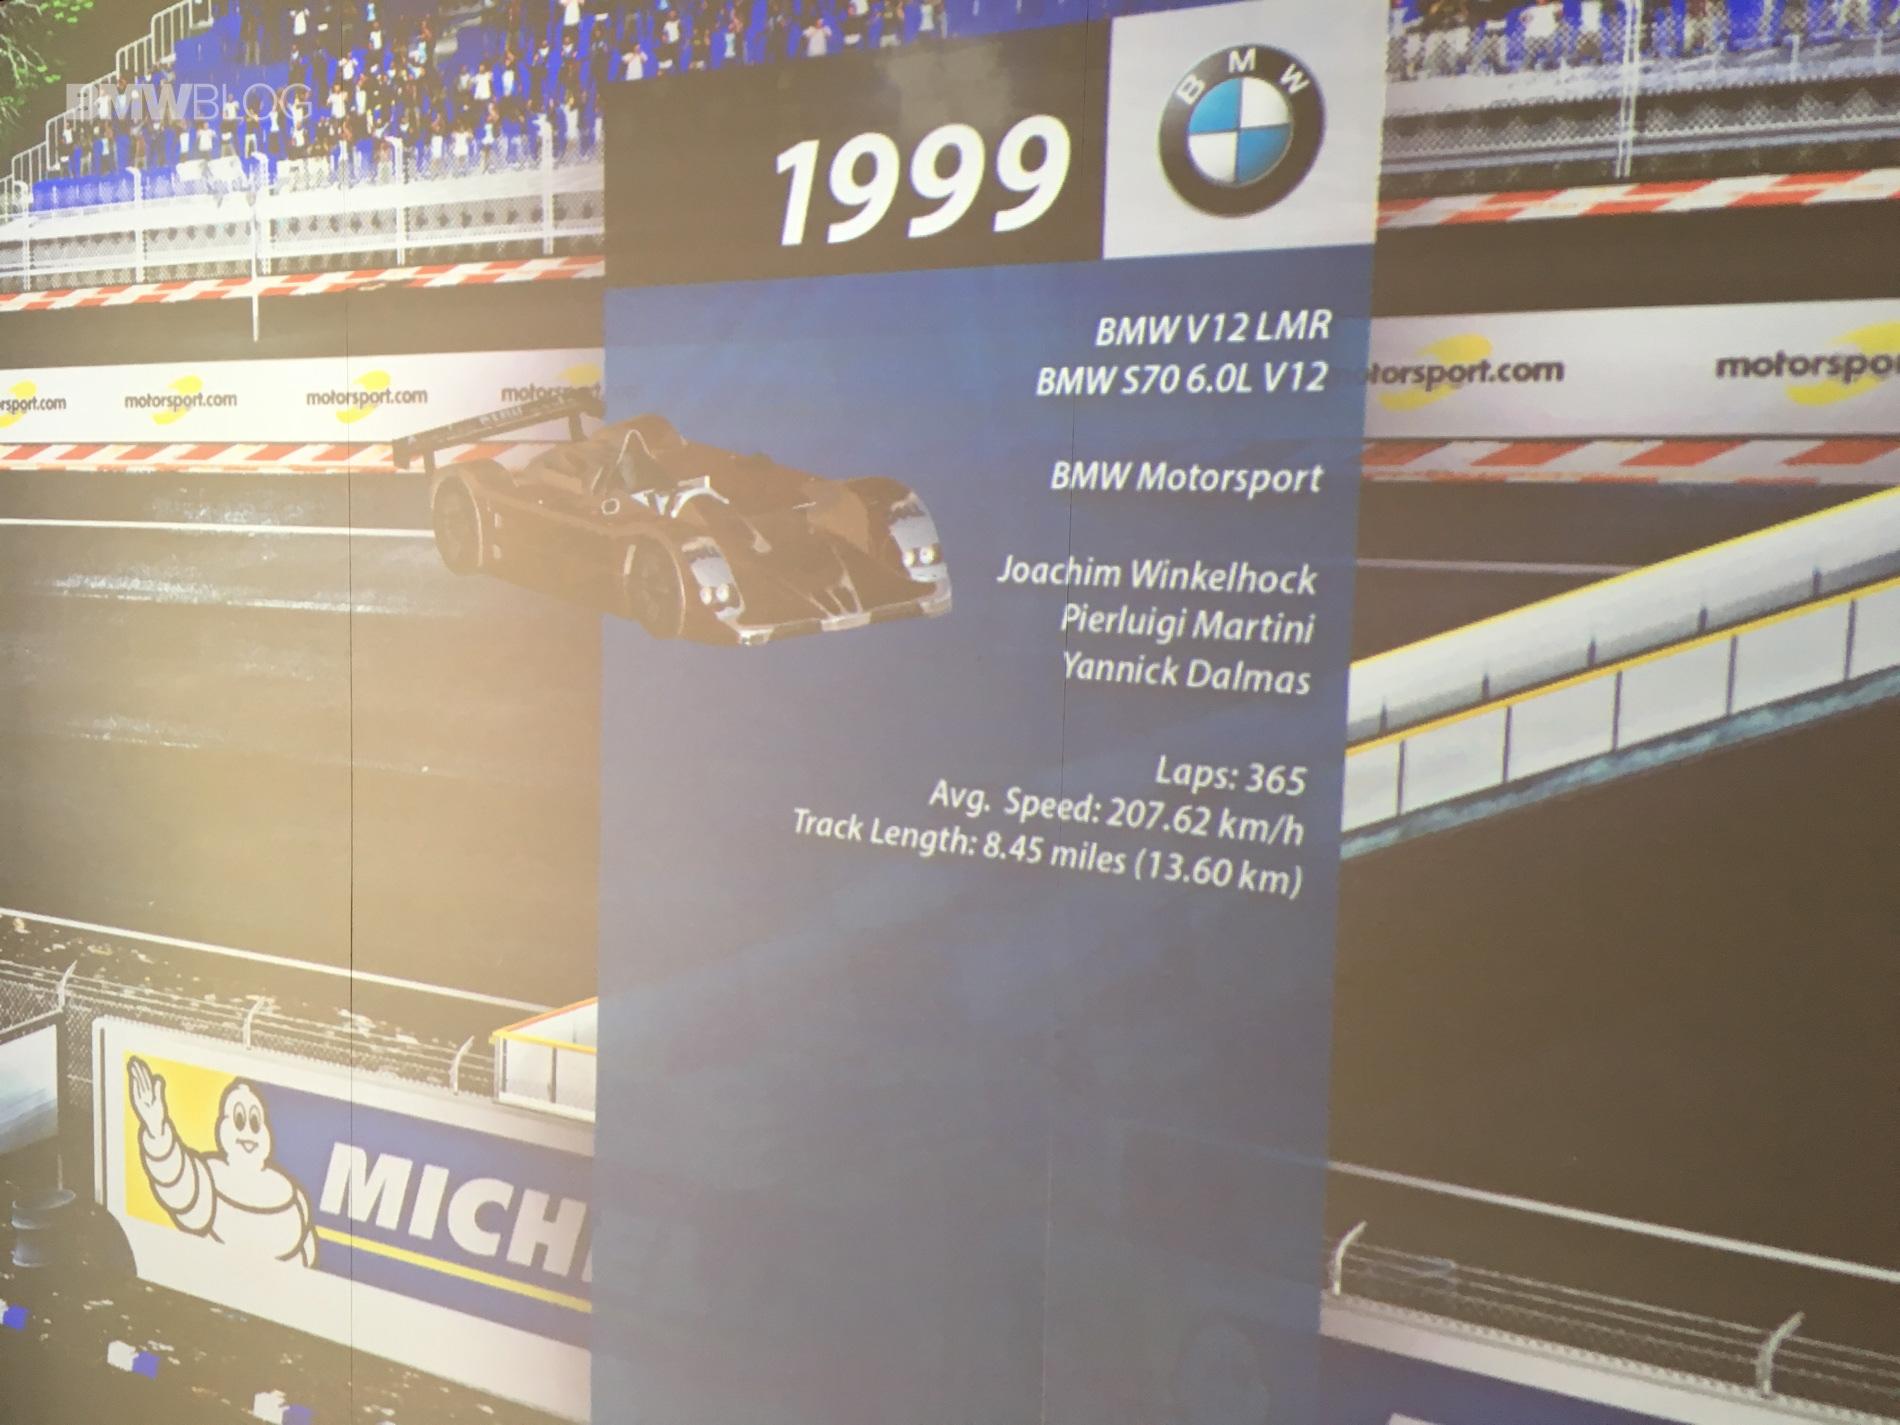 Michelin Digital Display Le Mans 2